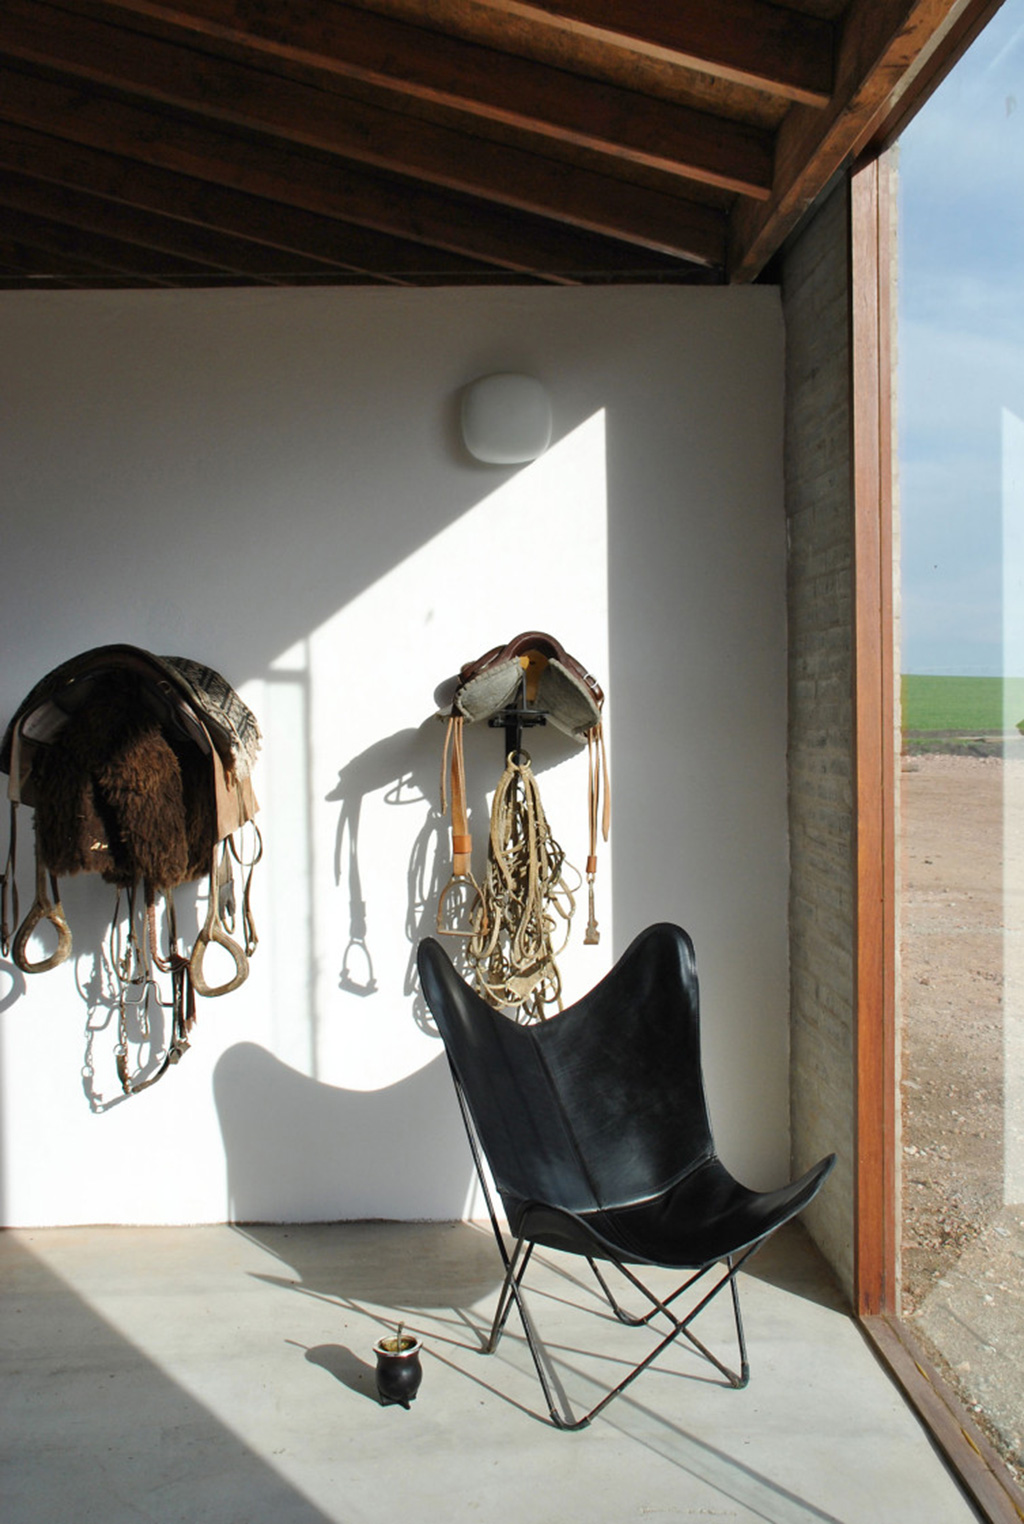 equine design - La Solana Stable, Uruguay. Designed by architect Nicolas Pinto da Mota